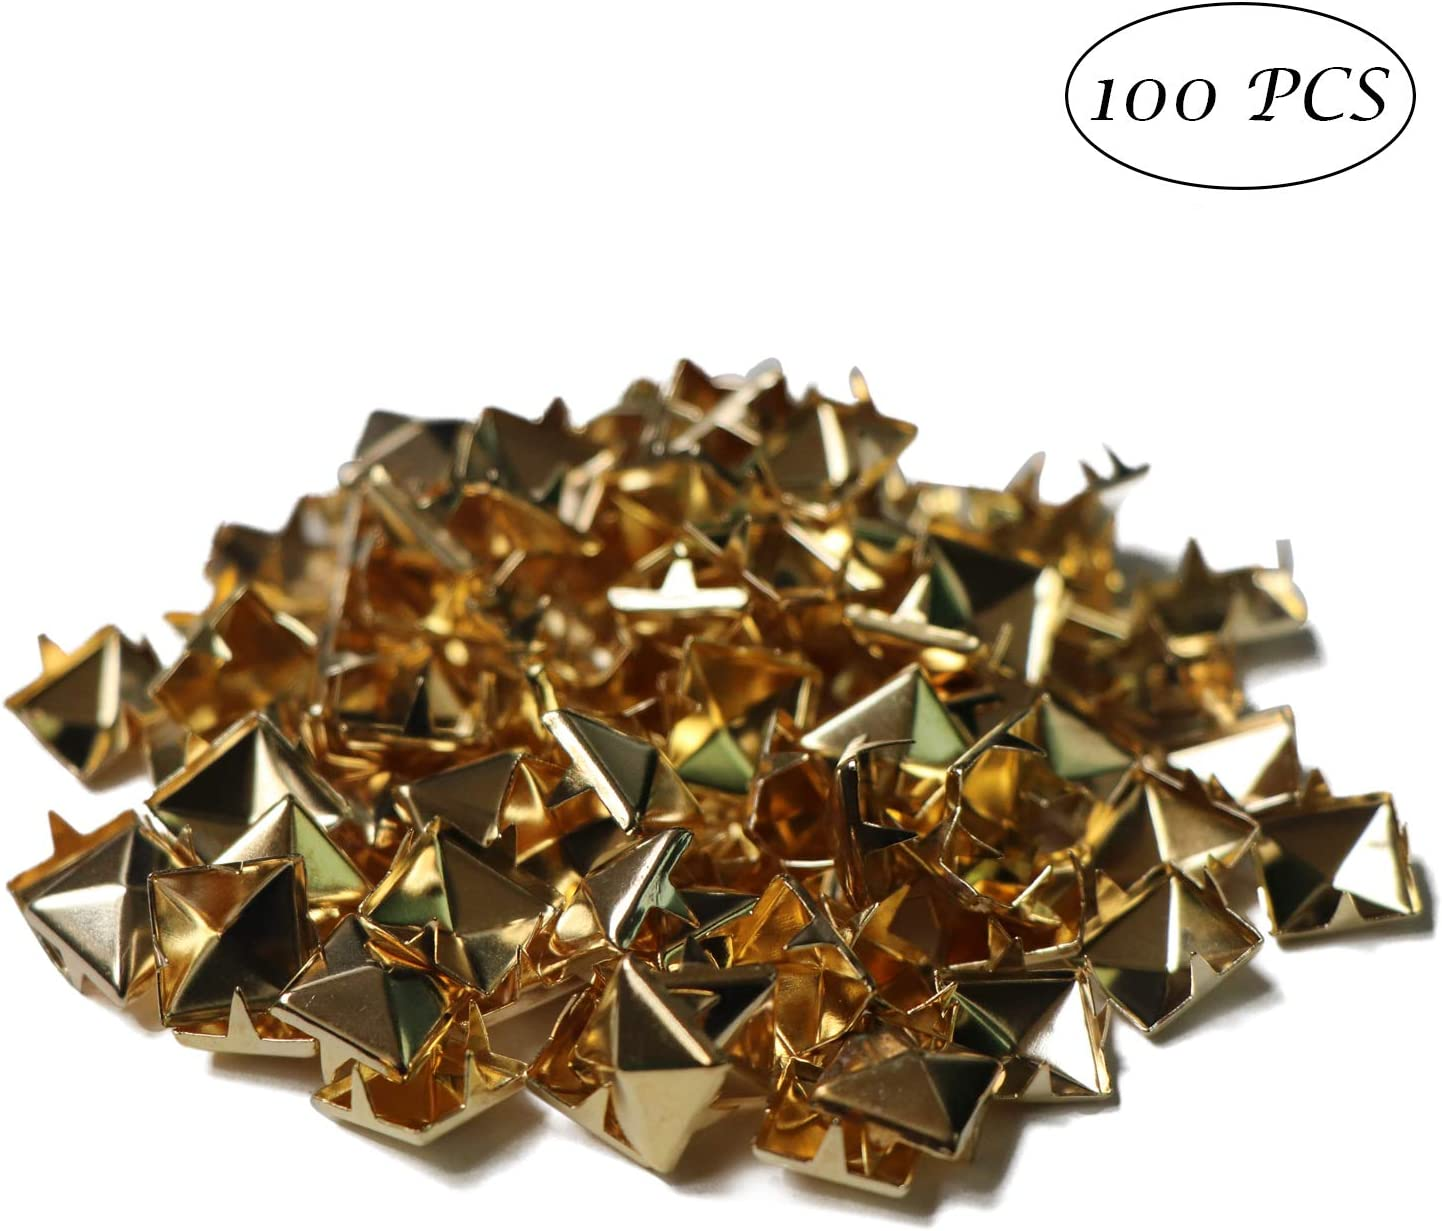 Gold SPWOLFRT 100PCS 10mm Pyramid Shaped Punk Rivet Studs Square DIY Pins Spots Spikes Nailhead for Leathercraft /& Belts